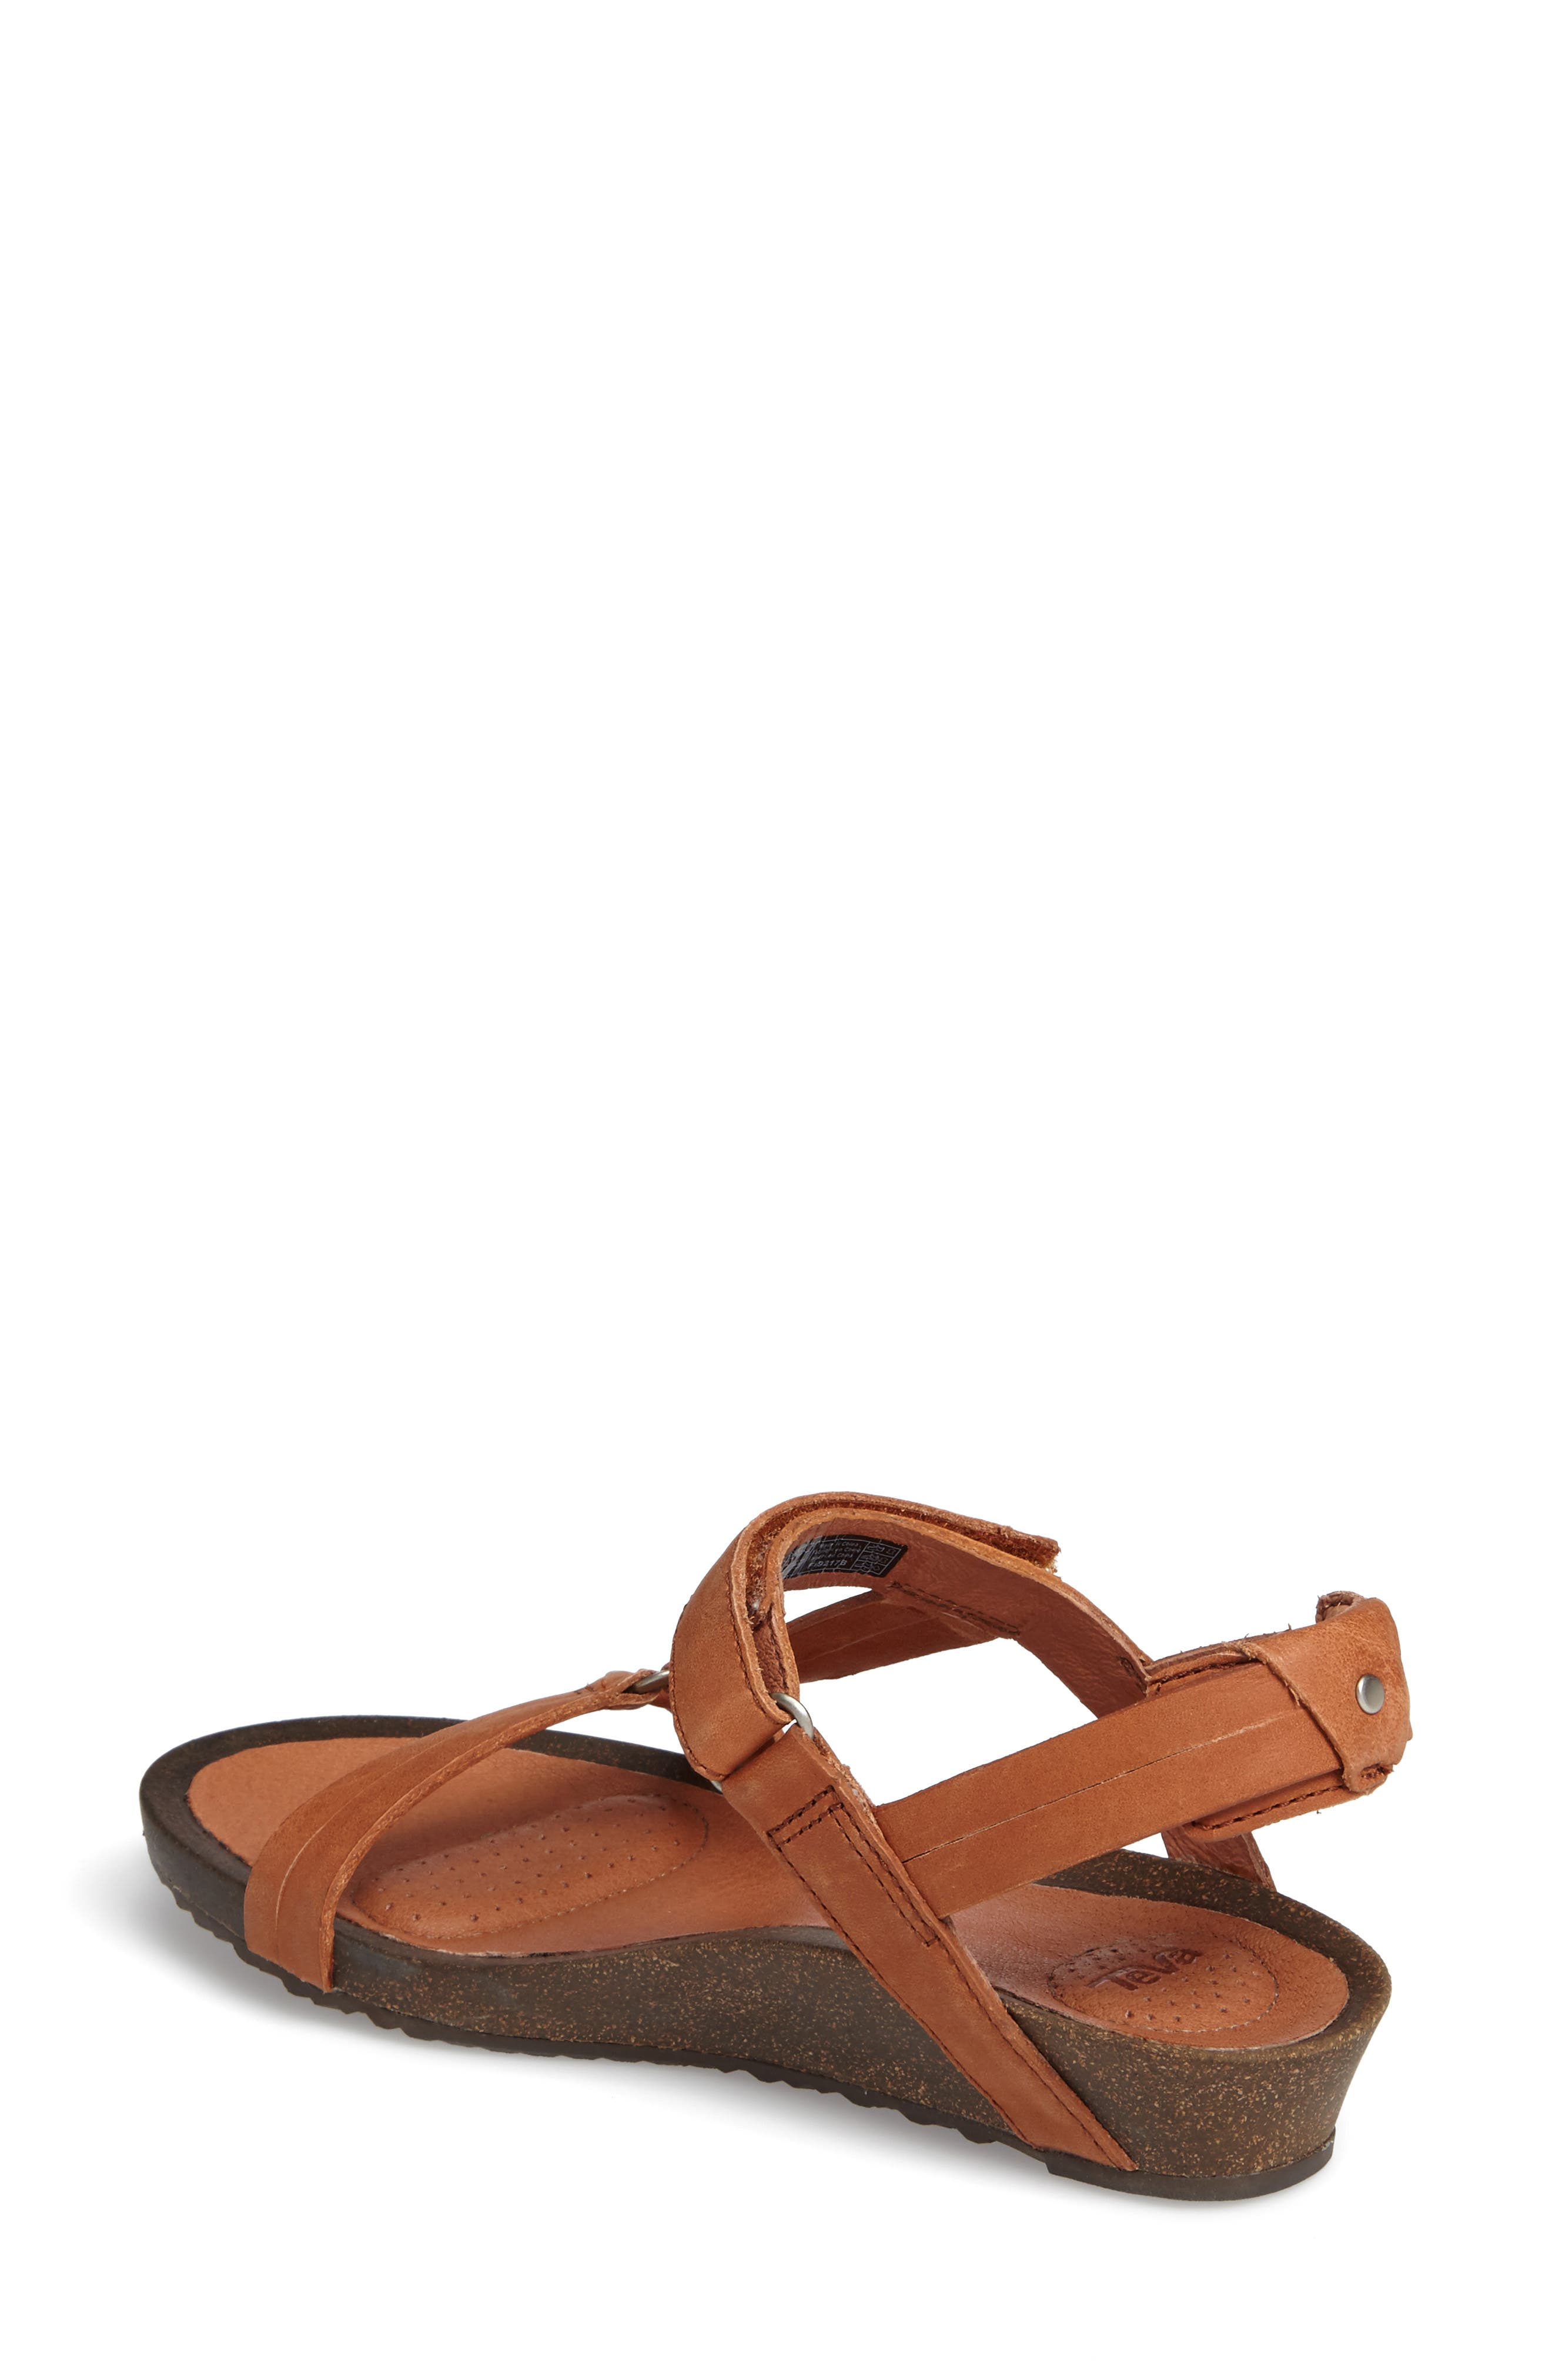 Ysidro Universal Sandal,                             Alternate thumbnail 2, color,                             Cognac Leather